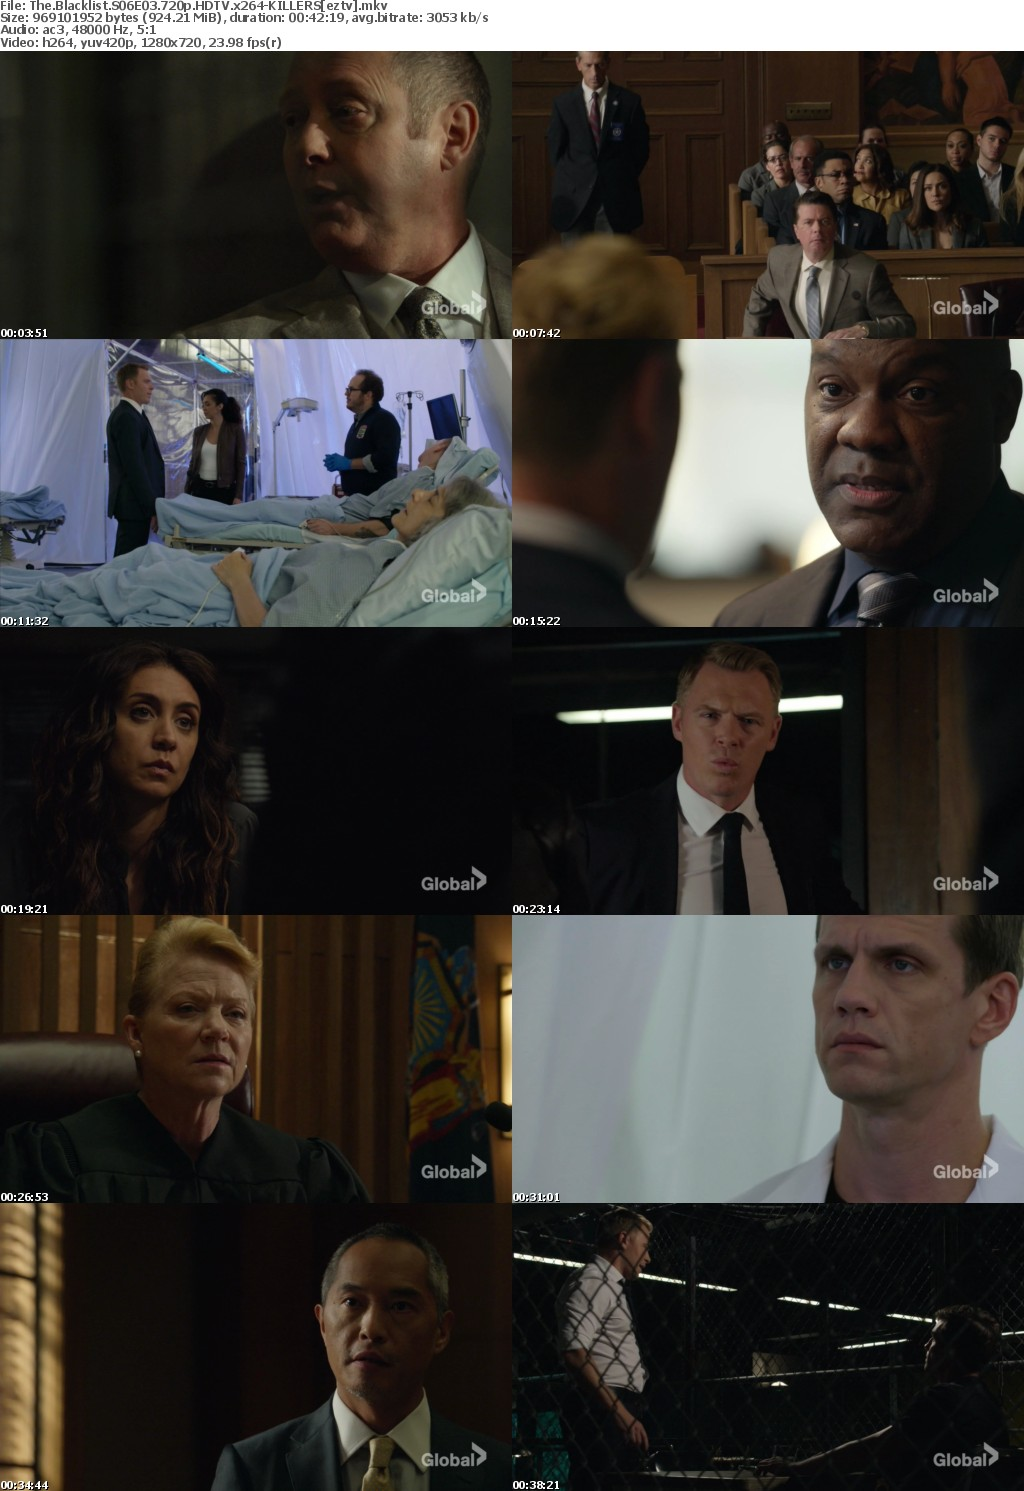 The Blacklist S06E03 720p HDTV x264-KILLERS